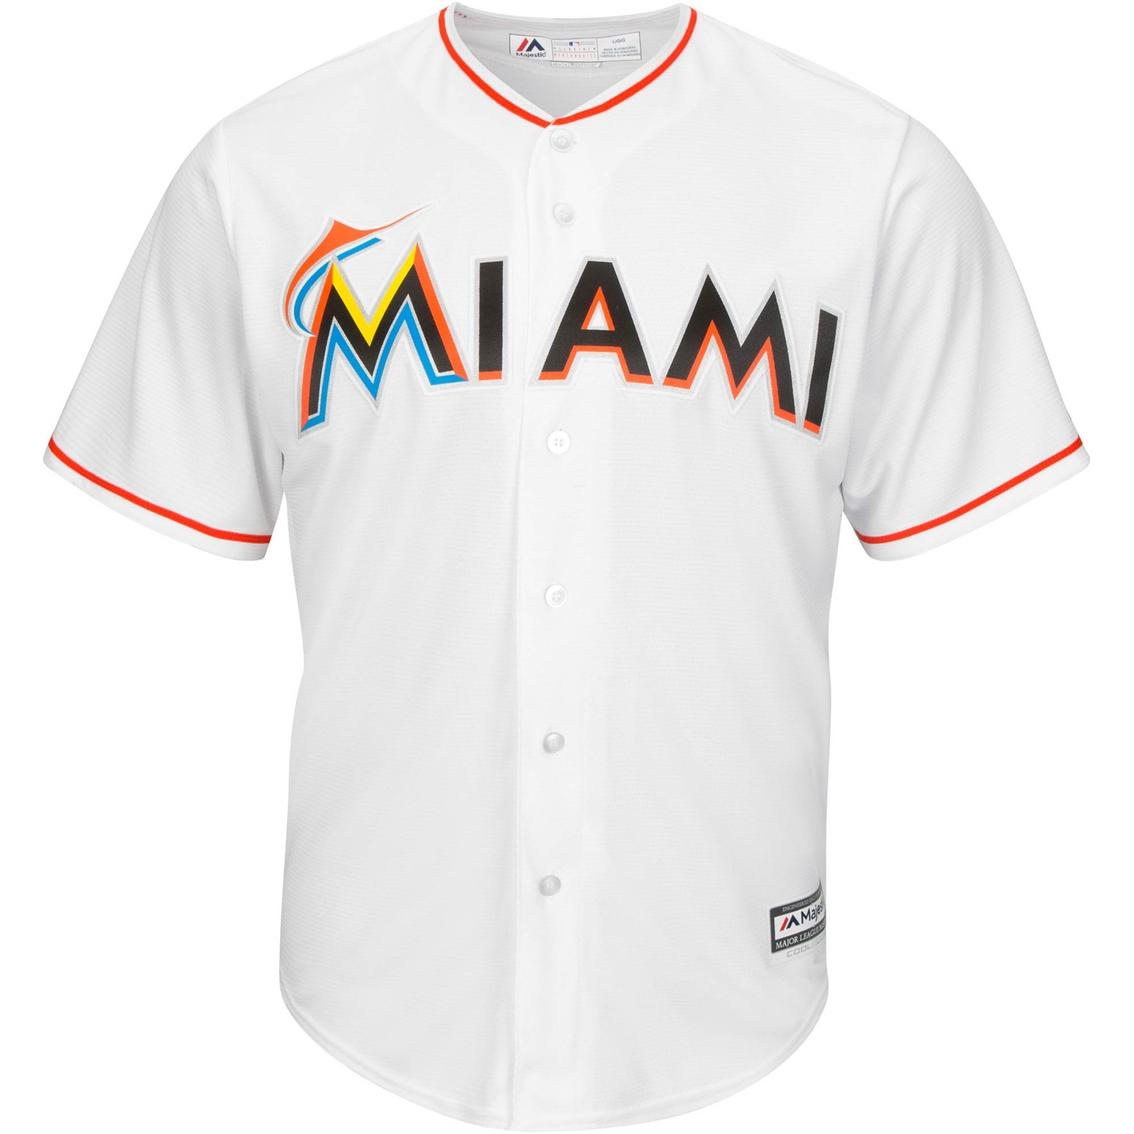 newest 85282 b49c5 Majestic Mlb Miami Marlins Home Replica Jersey   Shirts ...